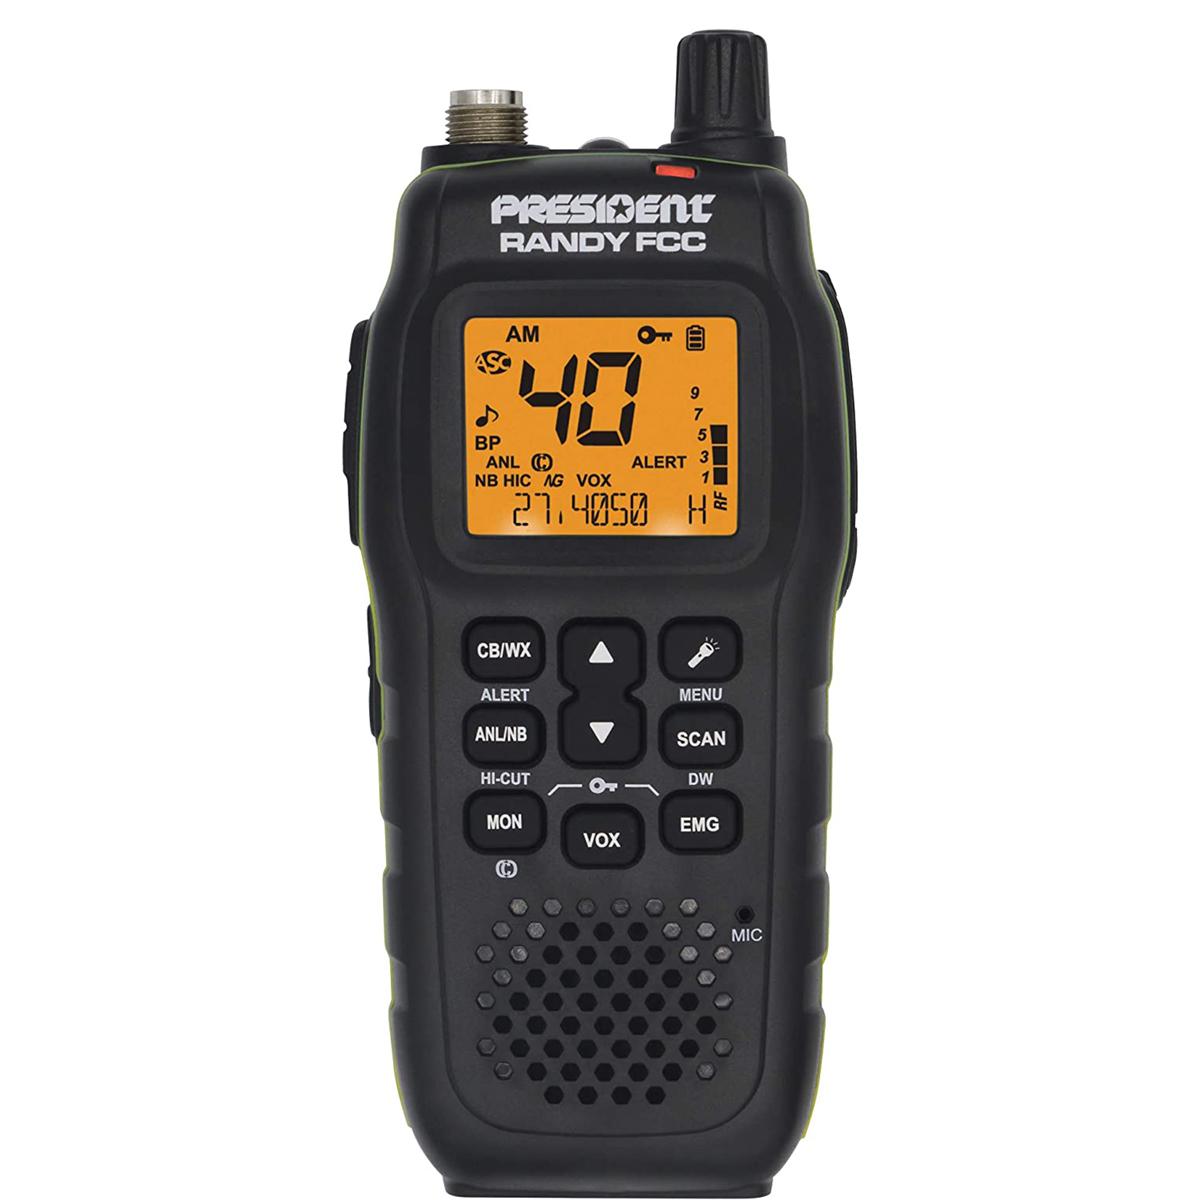 Handheld or Mobile CB Radio